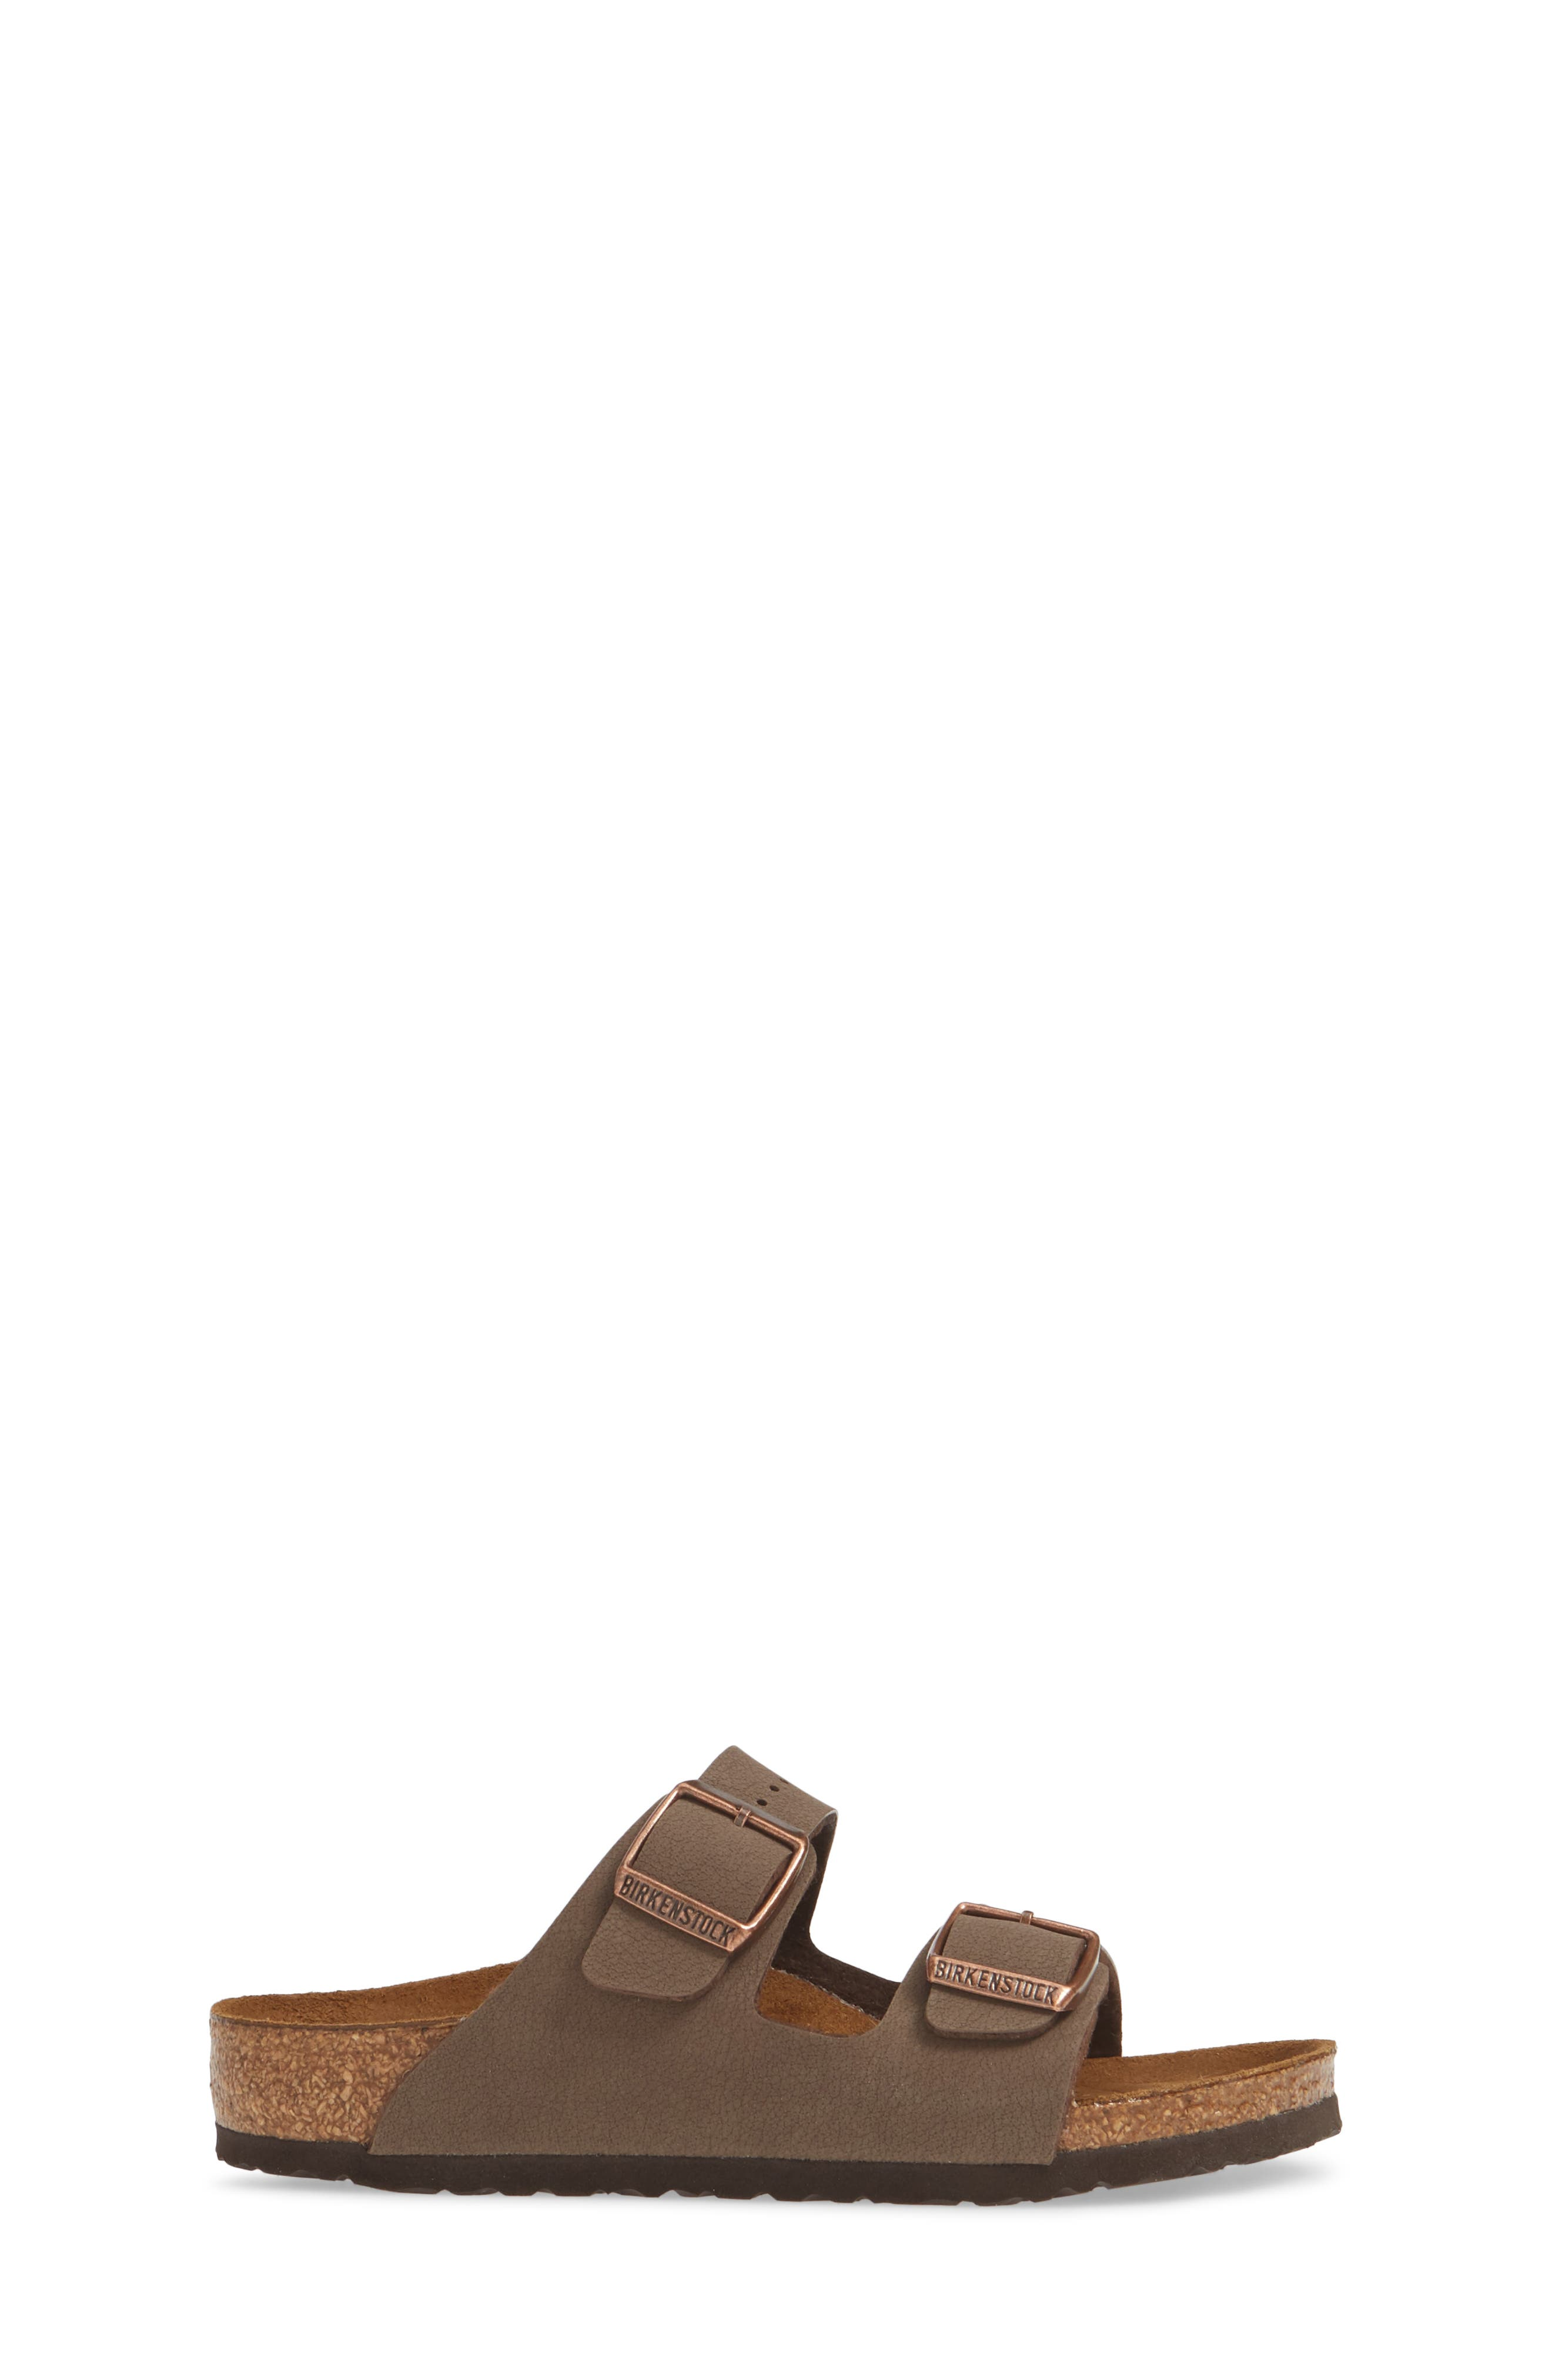 BIRKENSTOCK, 'Arizona' Suede Sandal, Alternate thumbnail 4, color, MOCHA